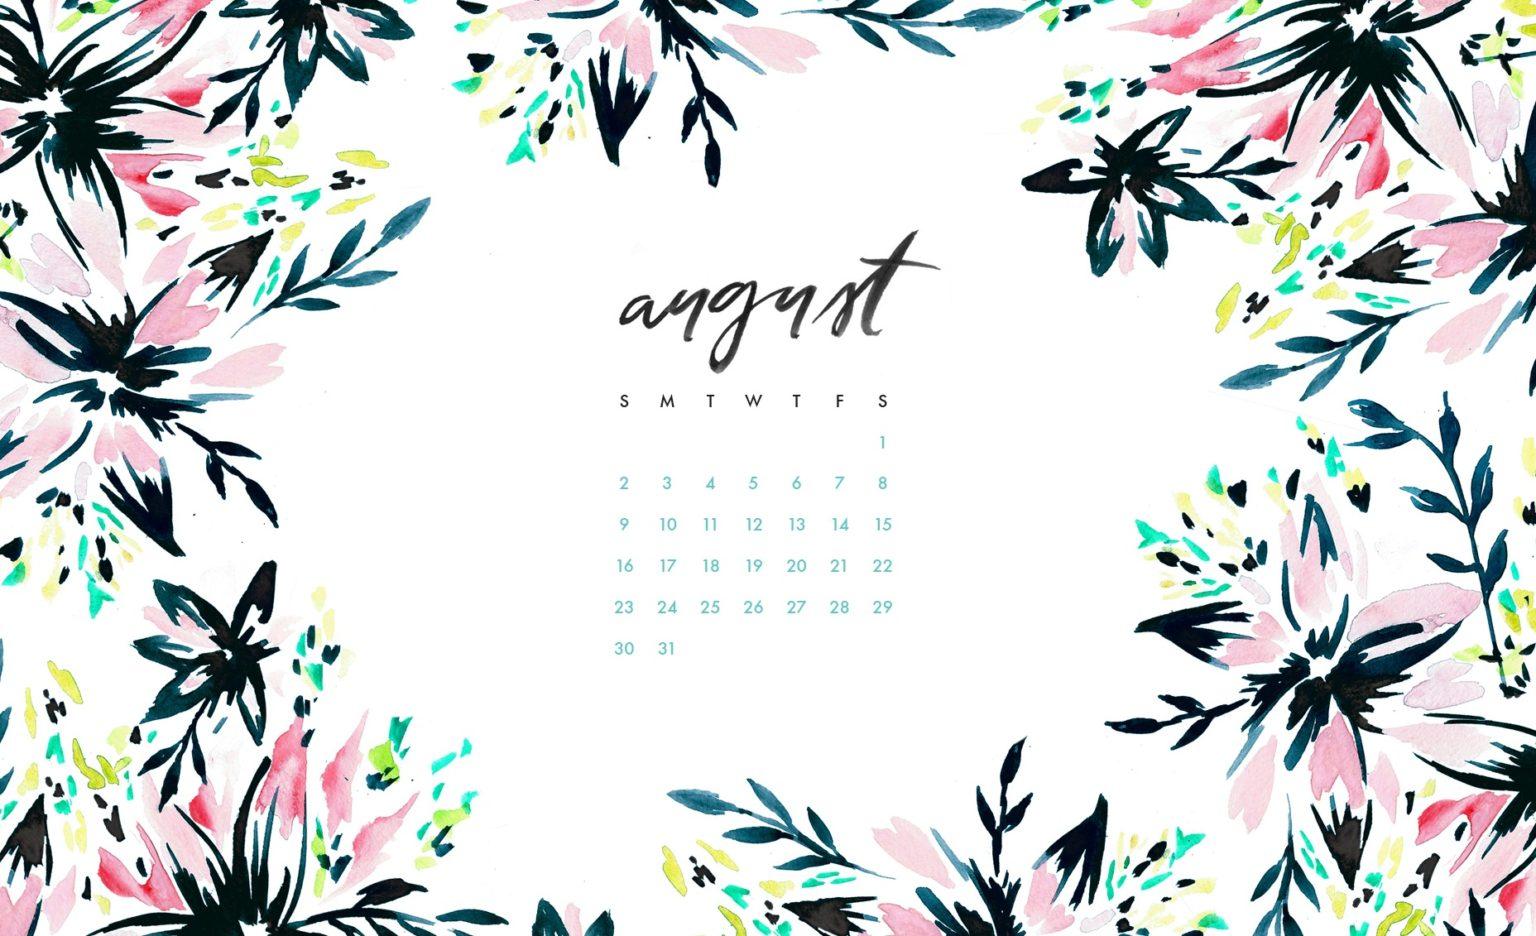 Floral August 2020 Desktop Wallpaper